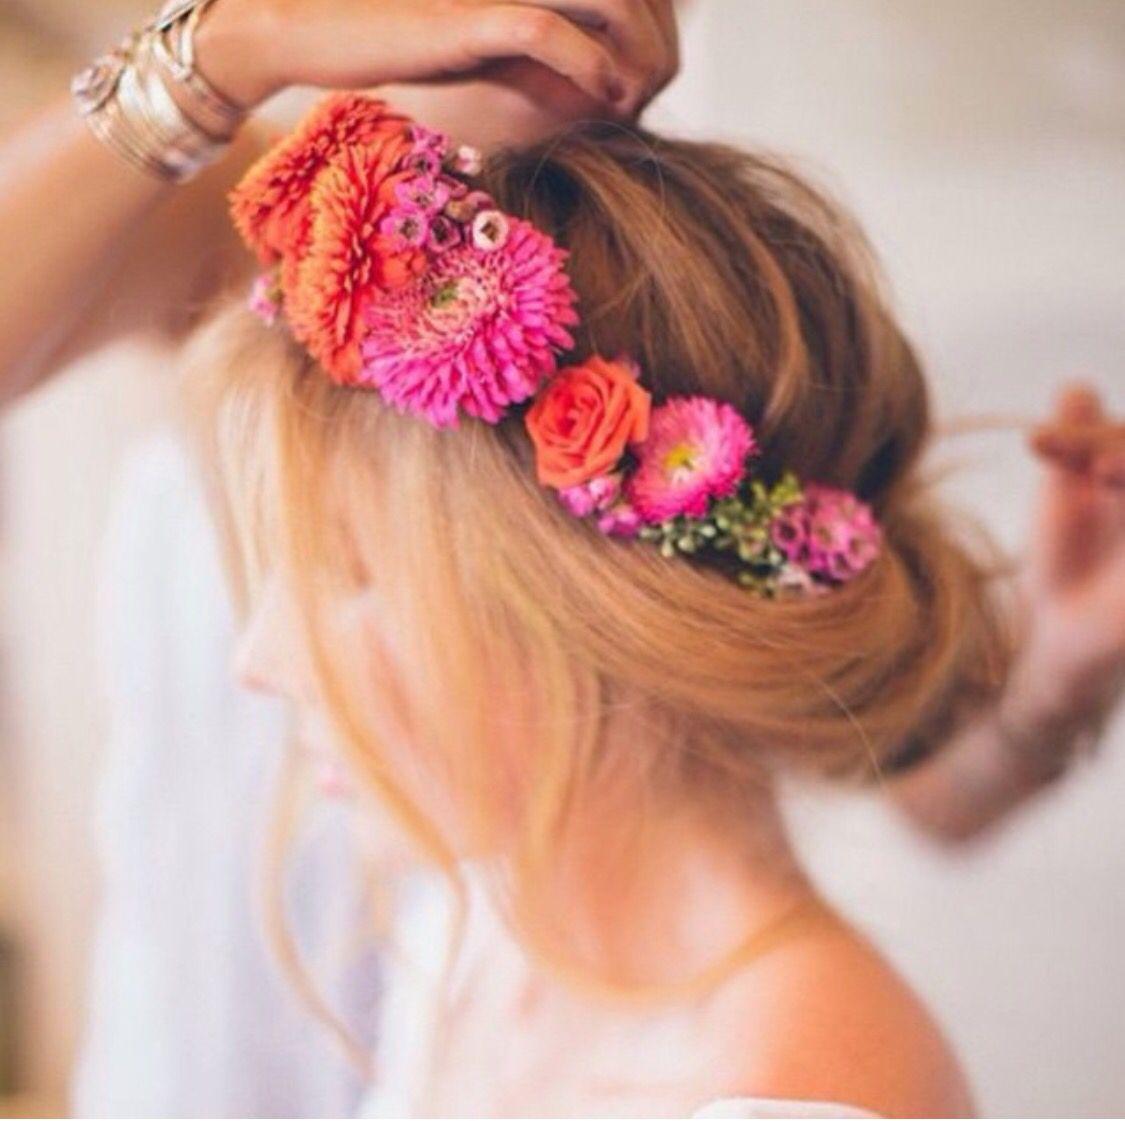 Hair style YaseminAksu | Beauty Magazine | Pinterest | Hair style ...